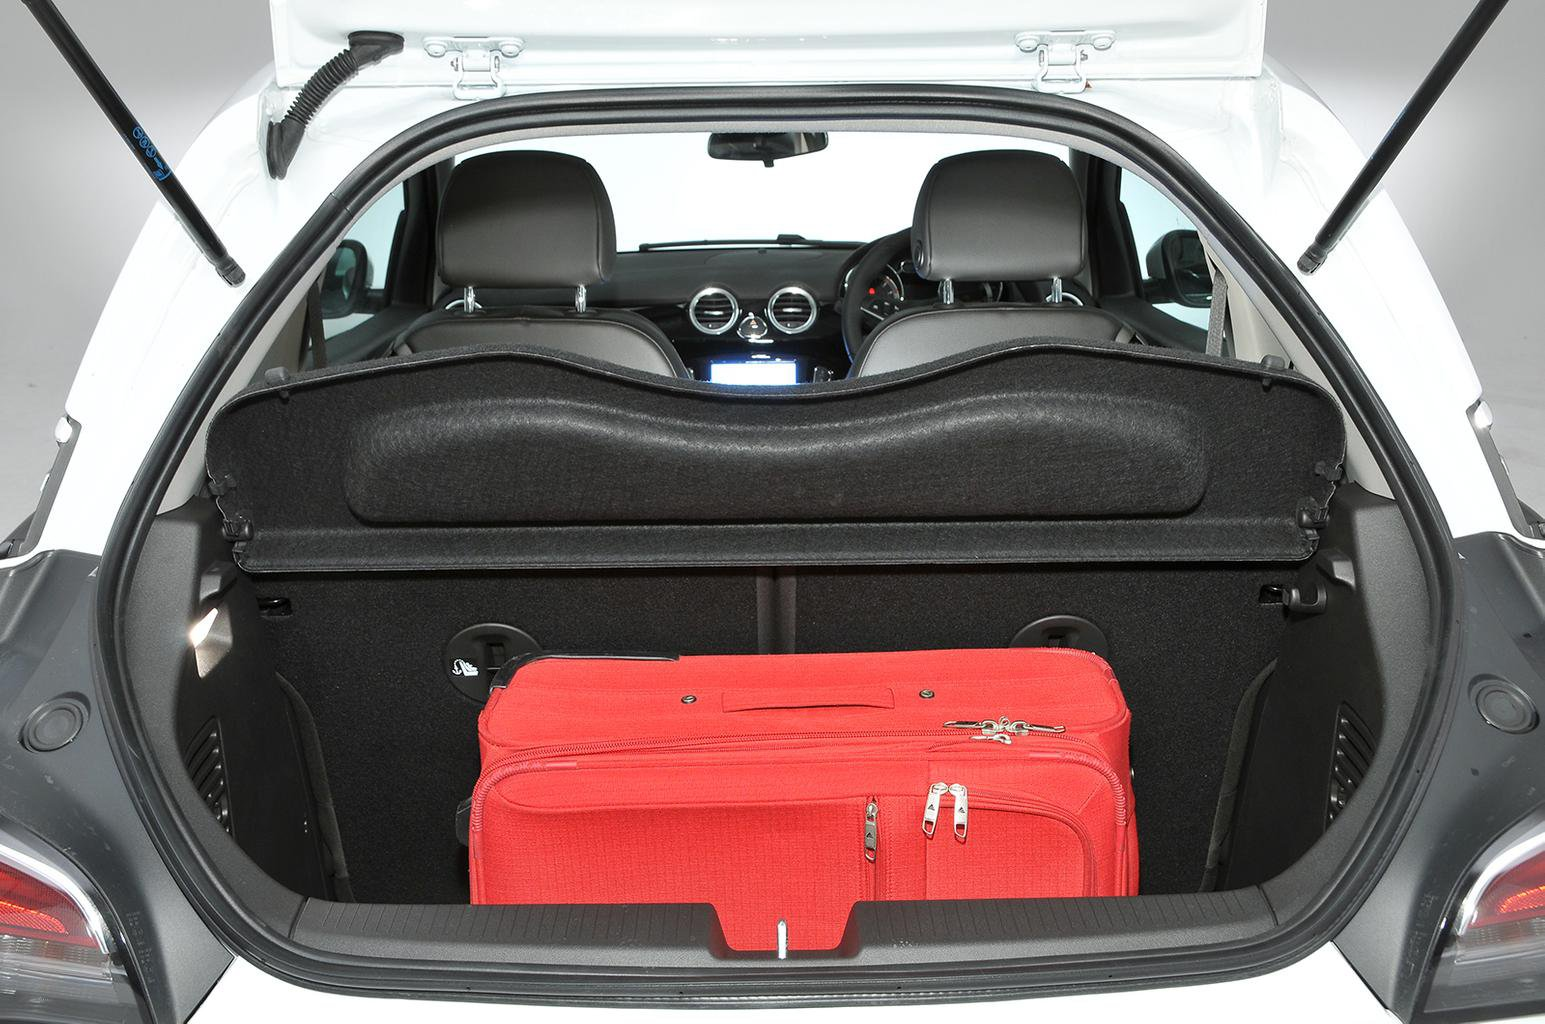 Used Vauxhall Adam 13-present